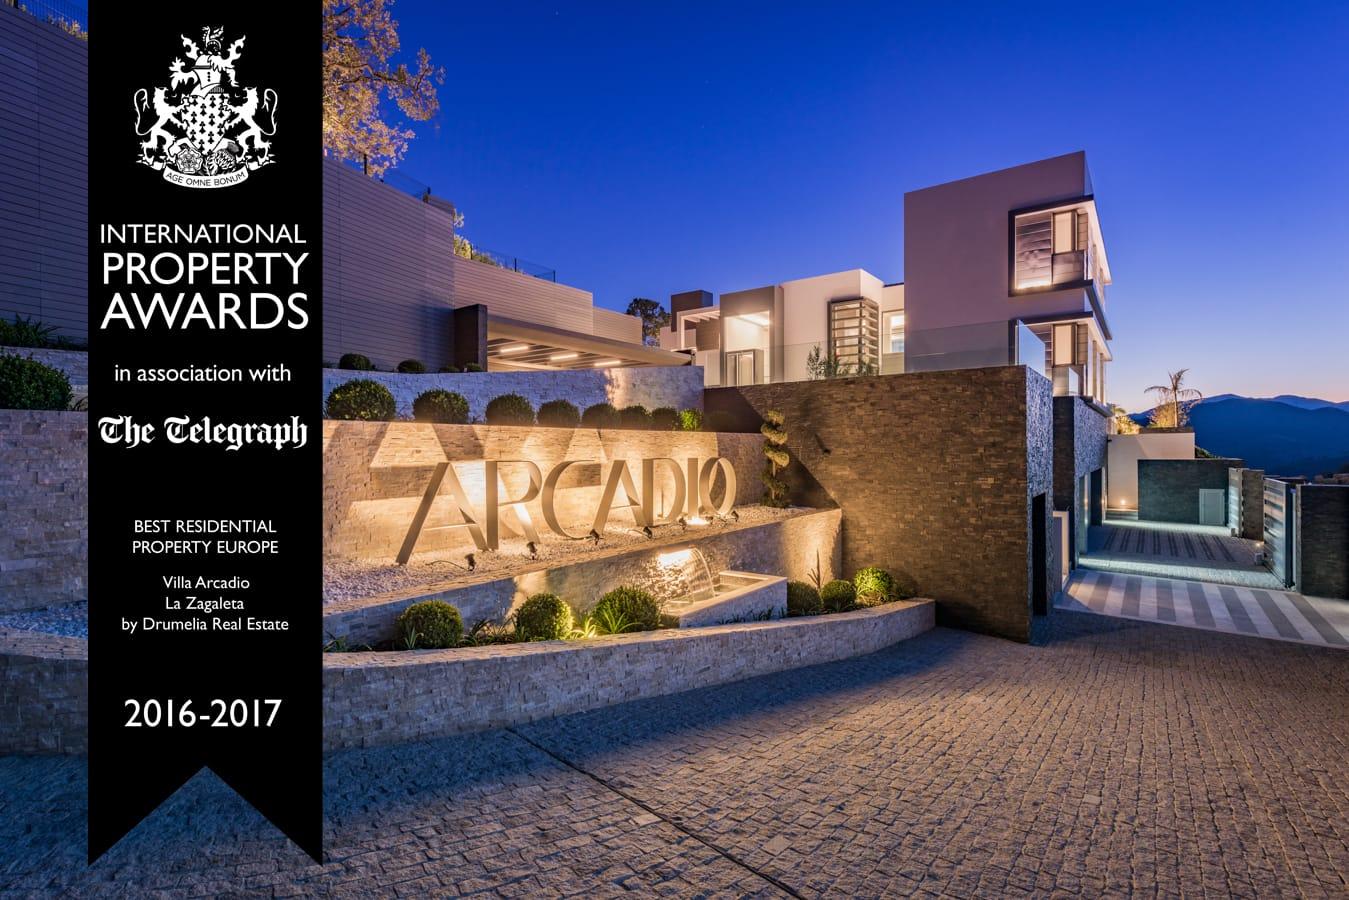 Villa Arcadio in La Zagaeta Best Property Europe